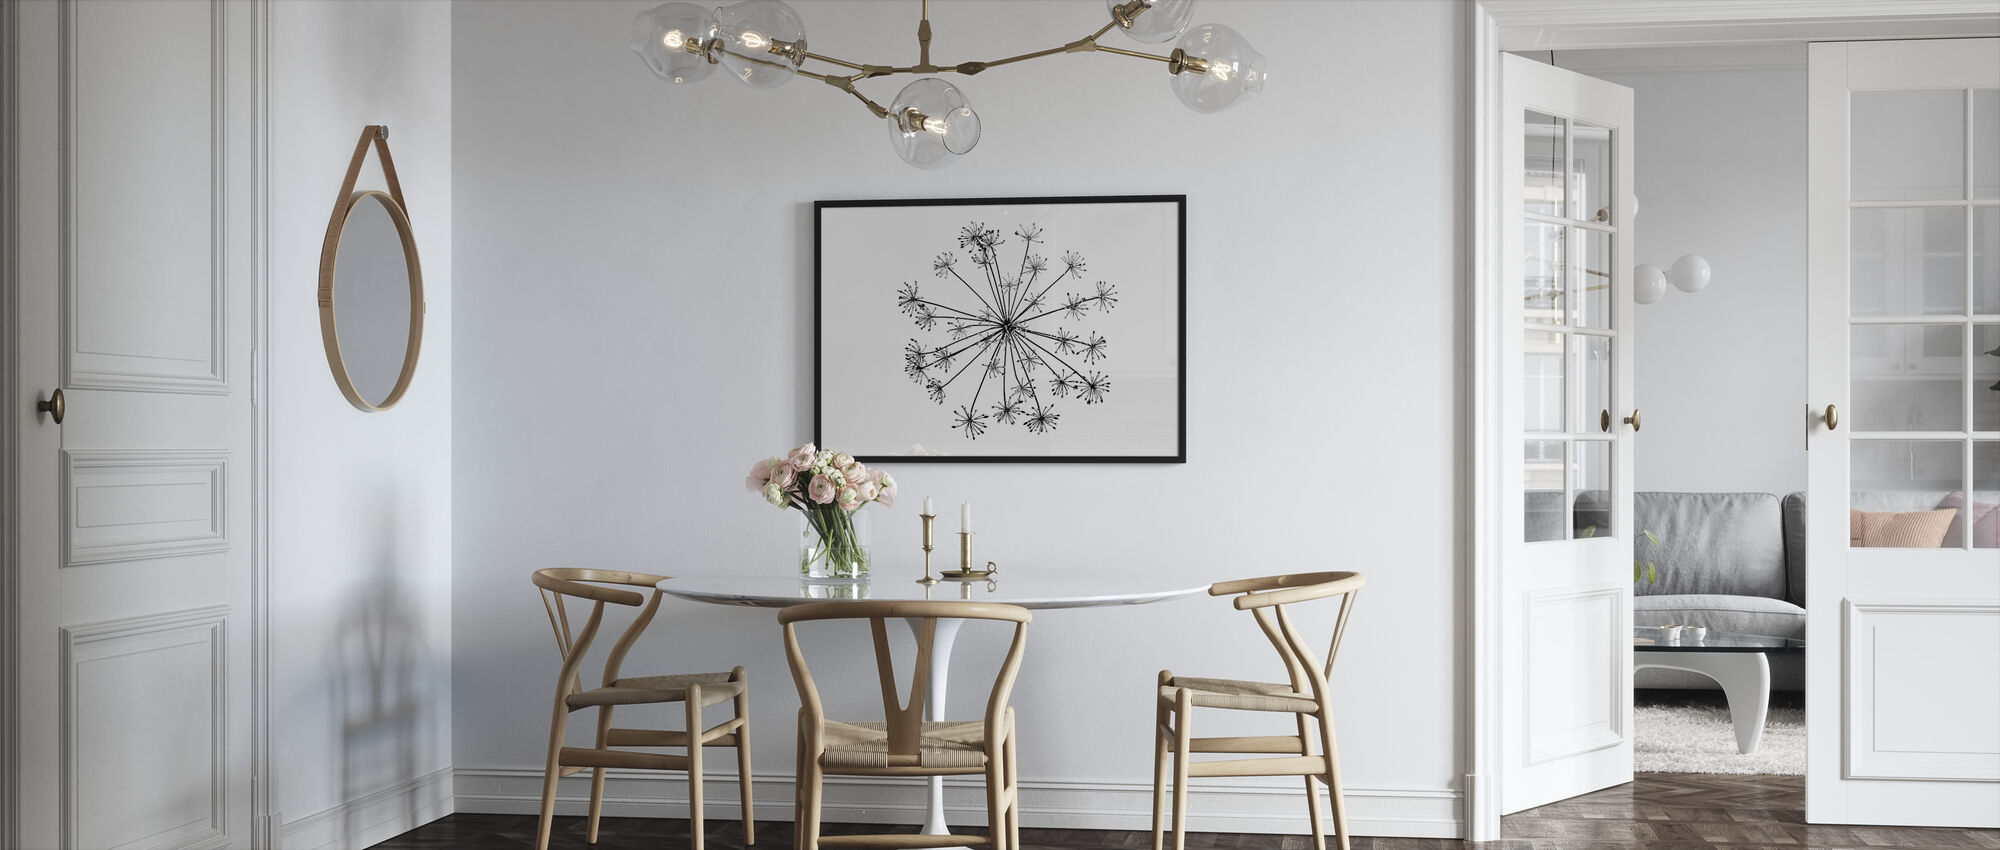 Dill - Framed print - Kitchen